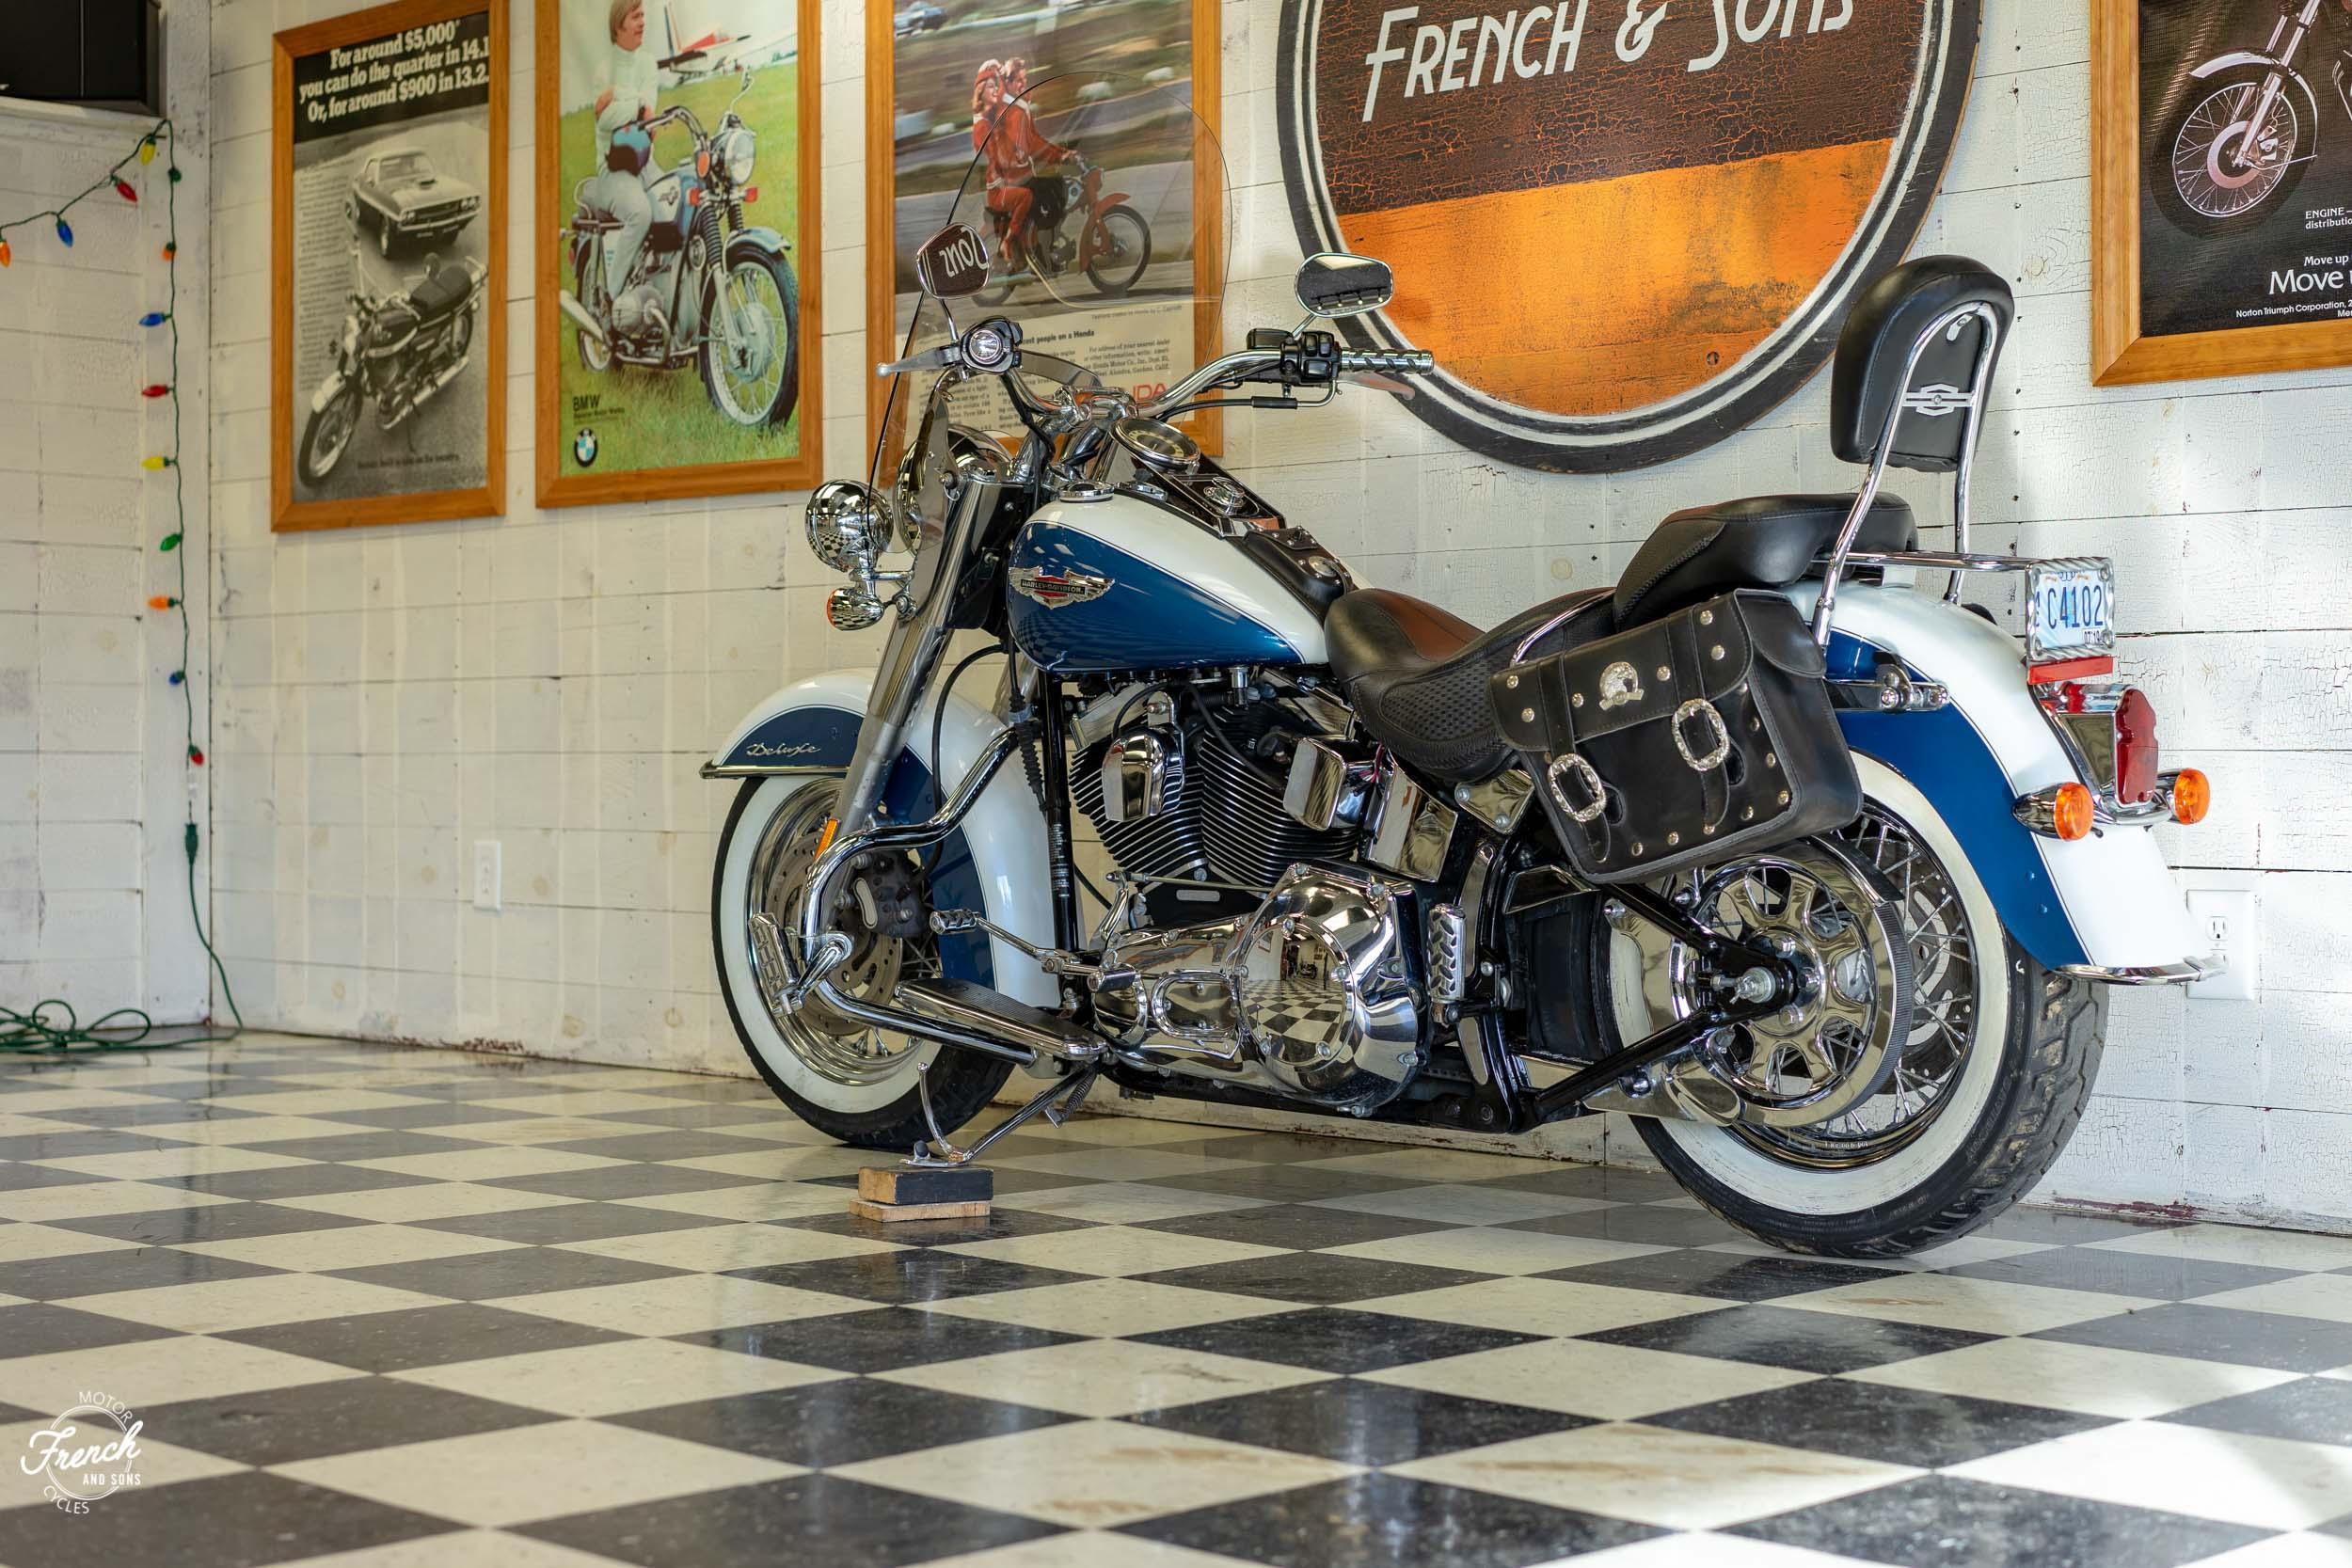 2005_Harley_Davidson_Softail_Deluxe-19.jpg